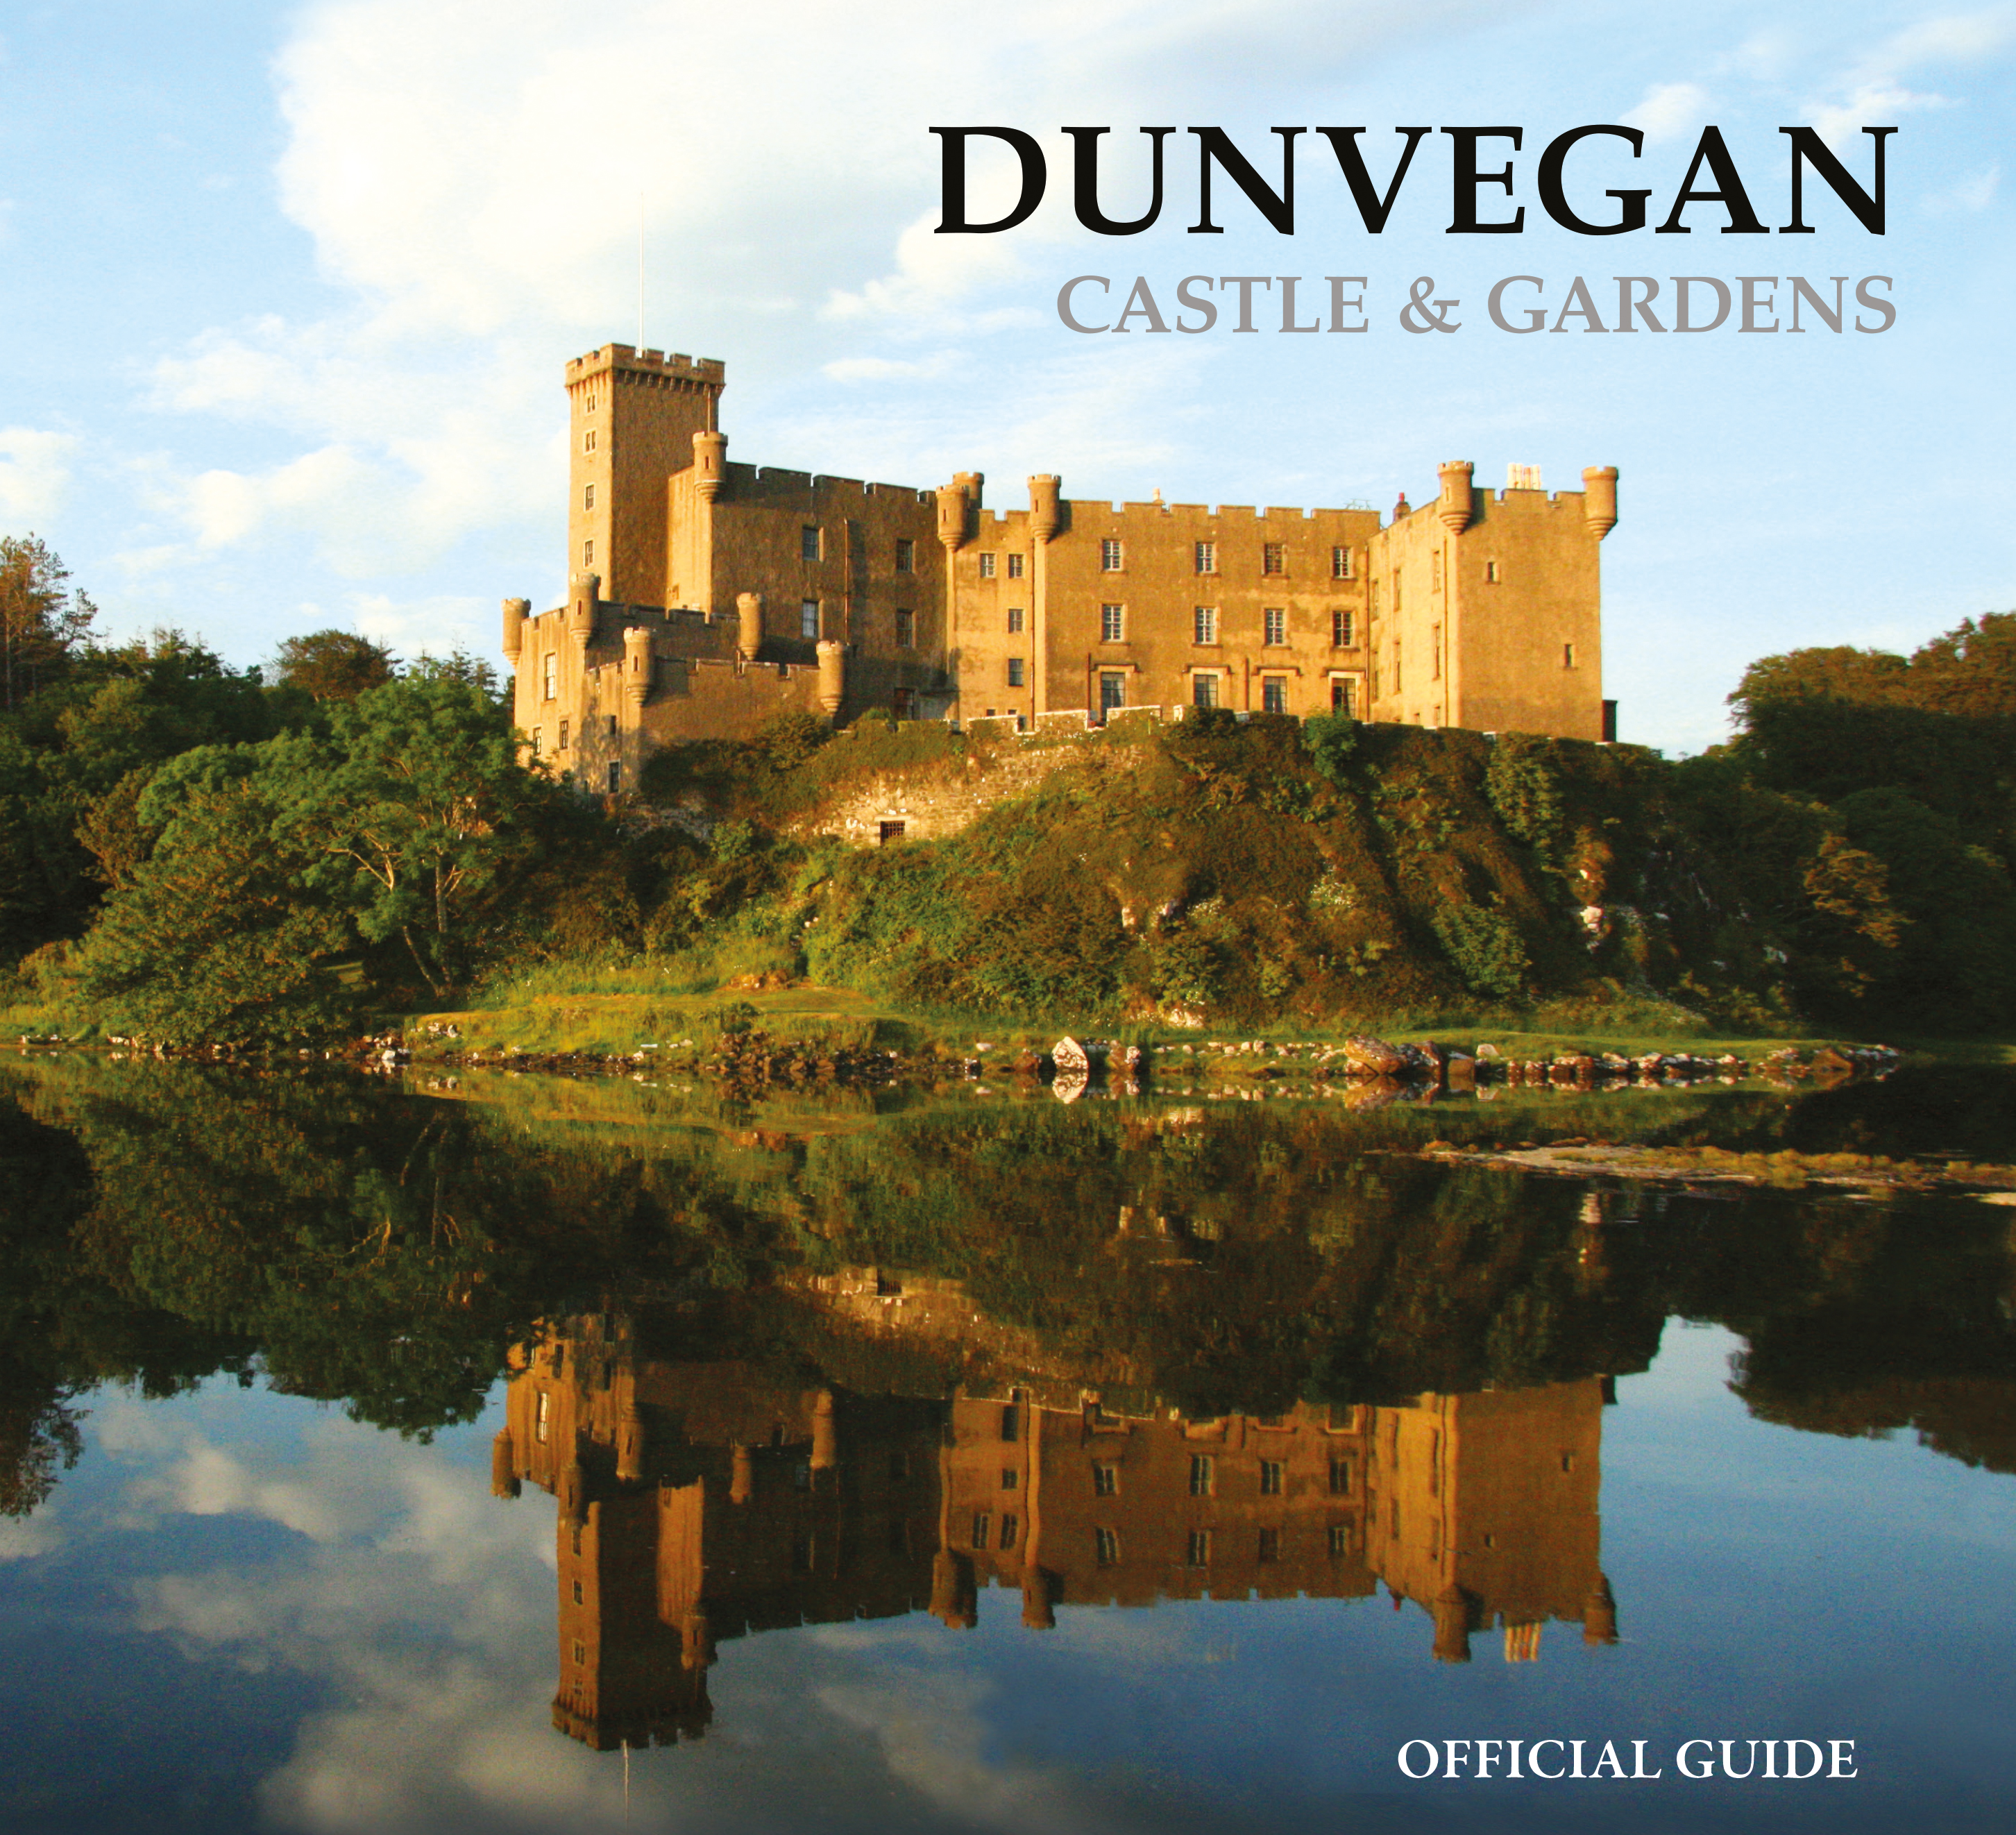 Dunvegan Castle & Gardens